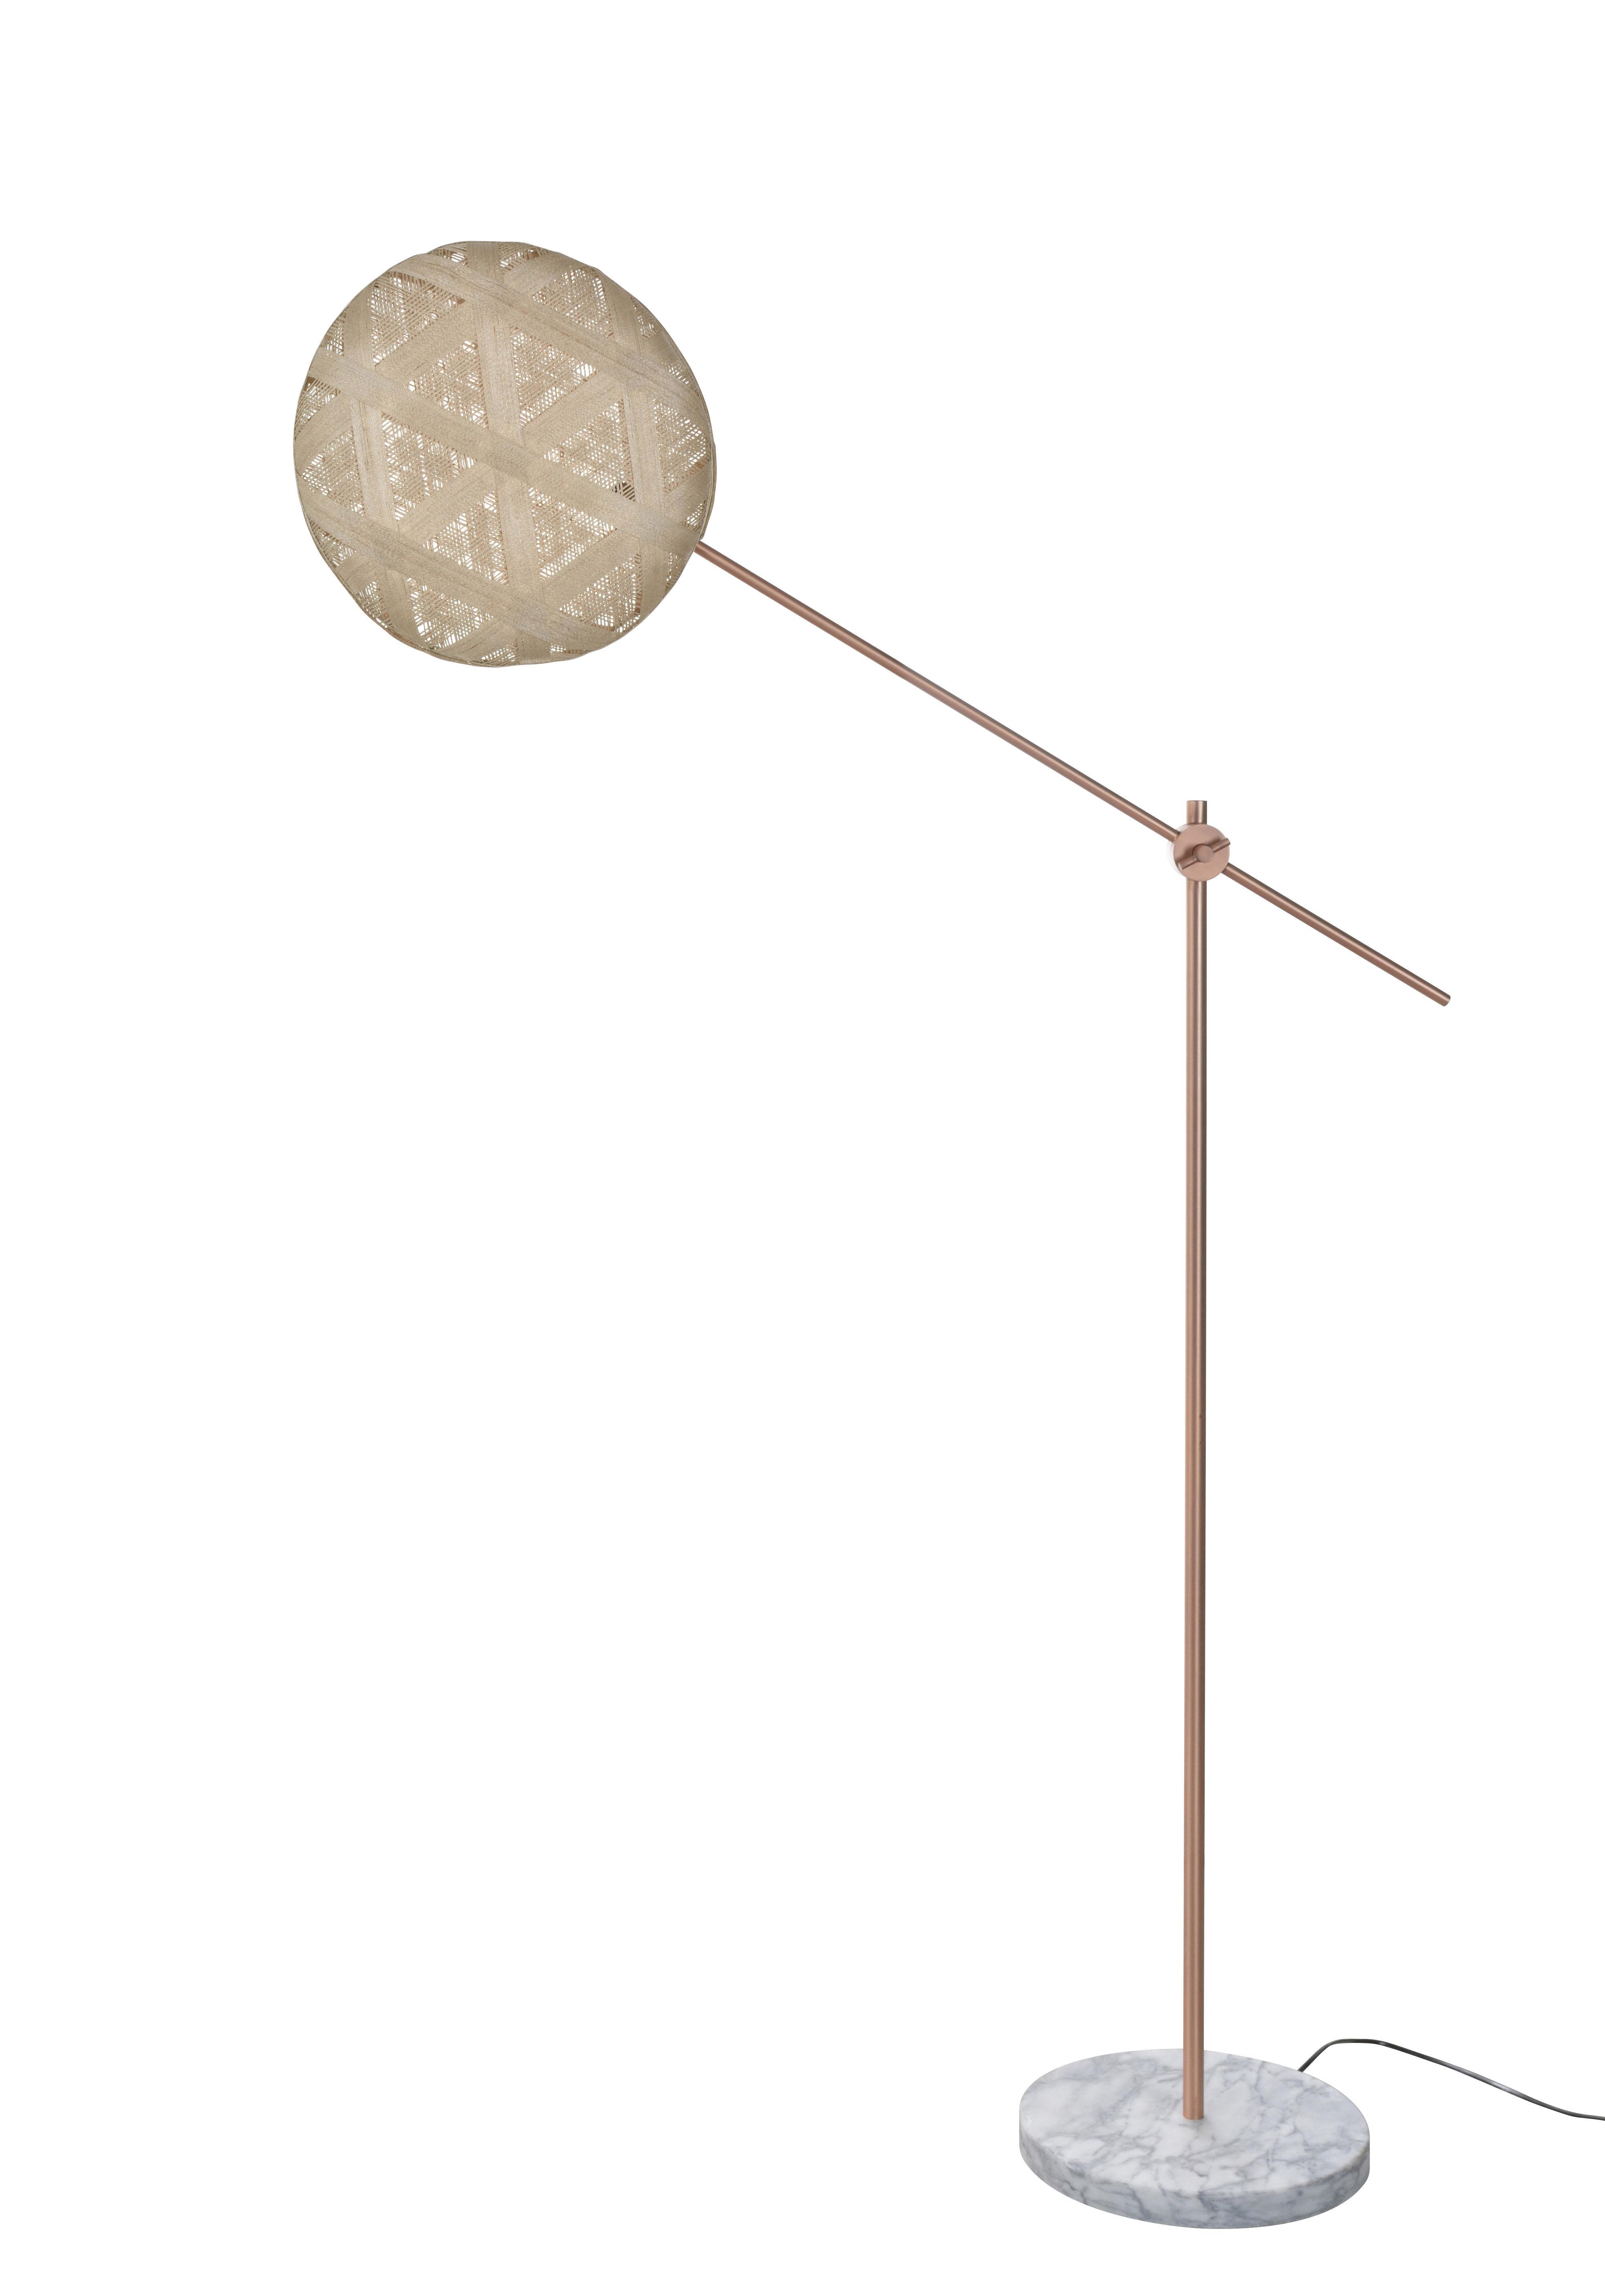 Luminaire - Lampadaires - Lampadaire Chanpen Hexagon / Ø 36 - Motifs triangles - Forestier - Beige / Cuivre - Abaca tissé, Marbre, Métal